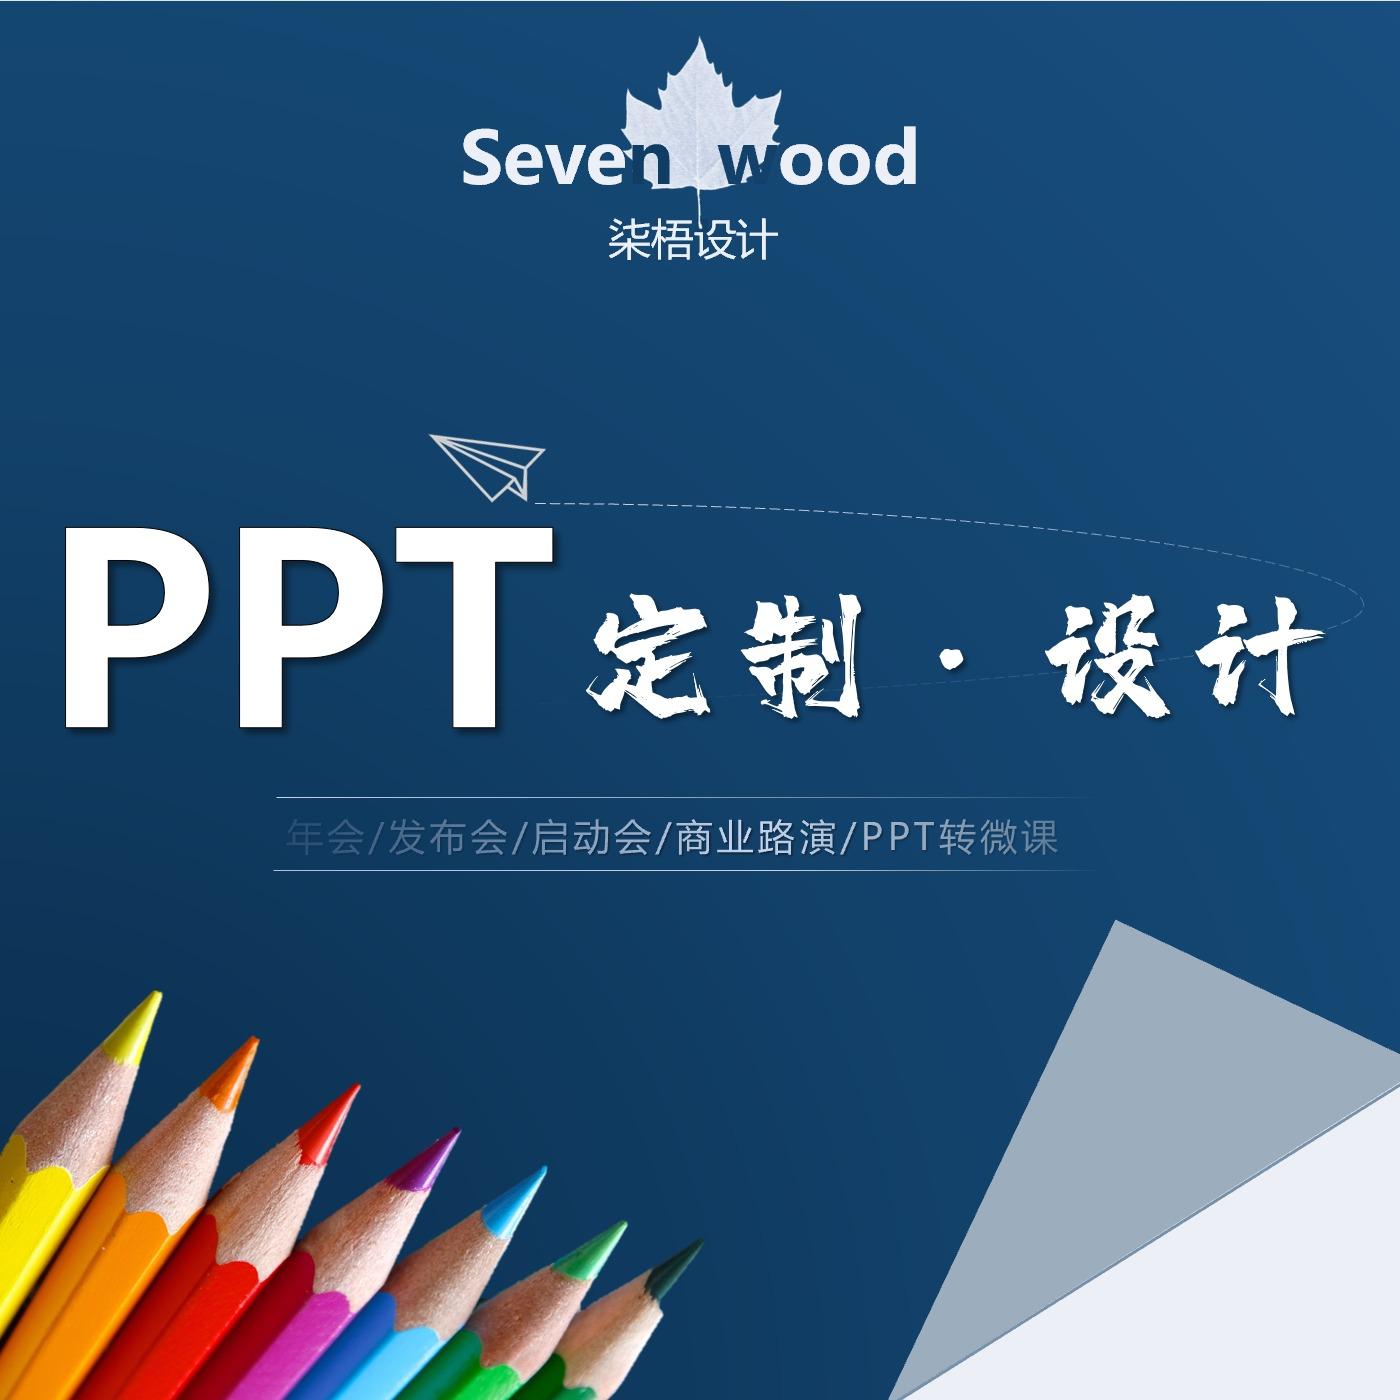 PPT制作/PPT美化/PPT动态/年会/发布会/商业路演